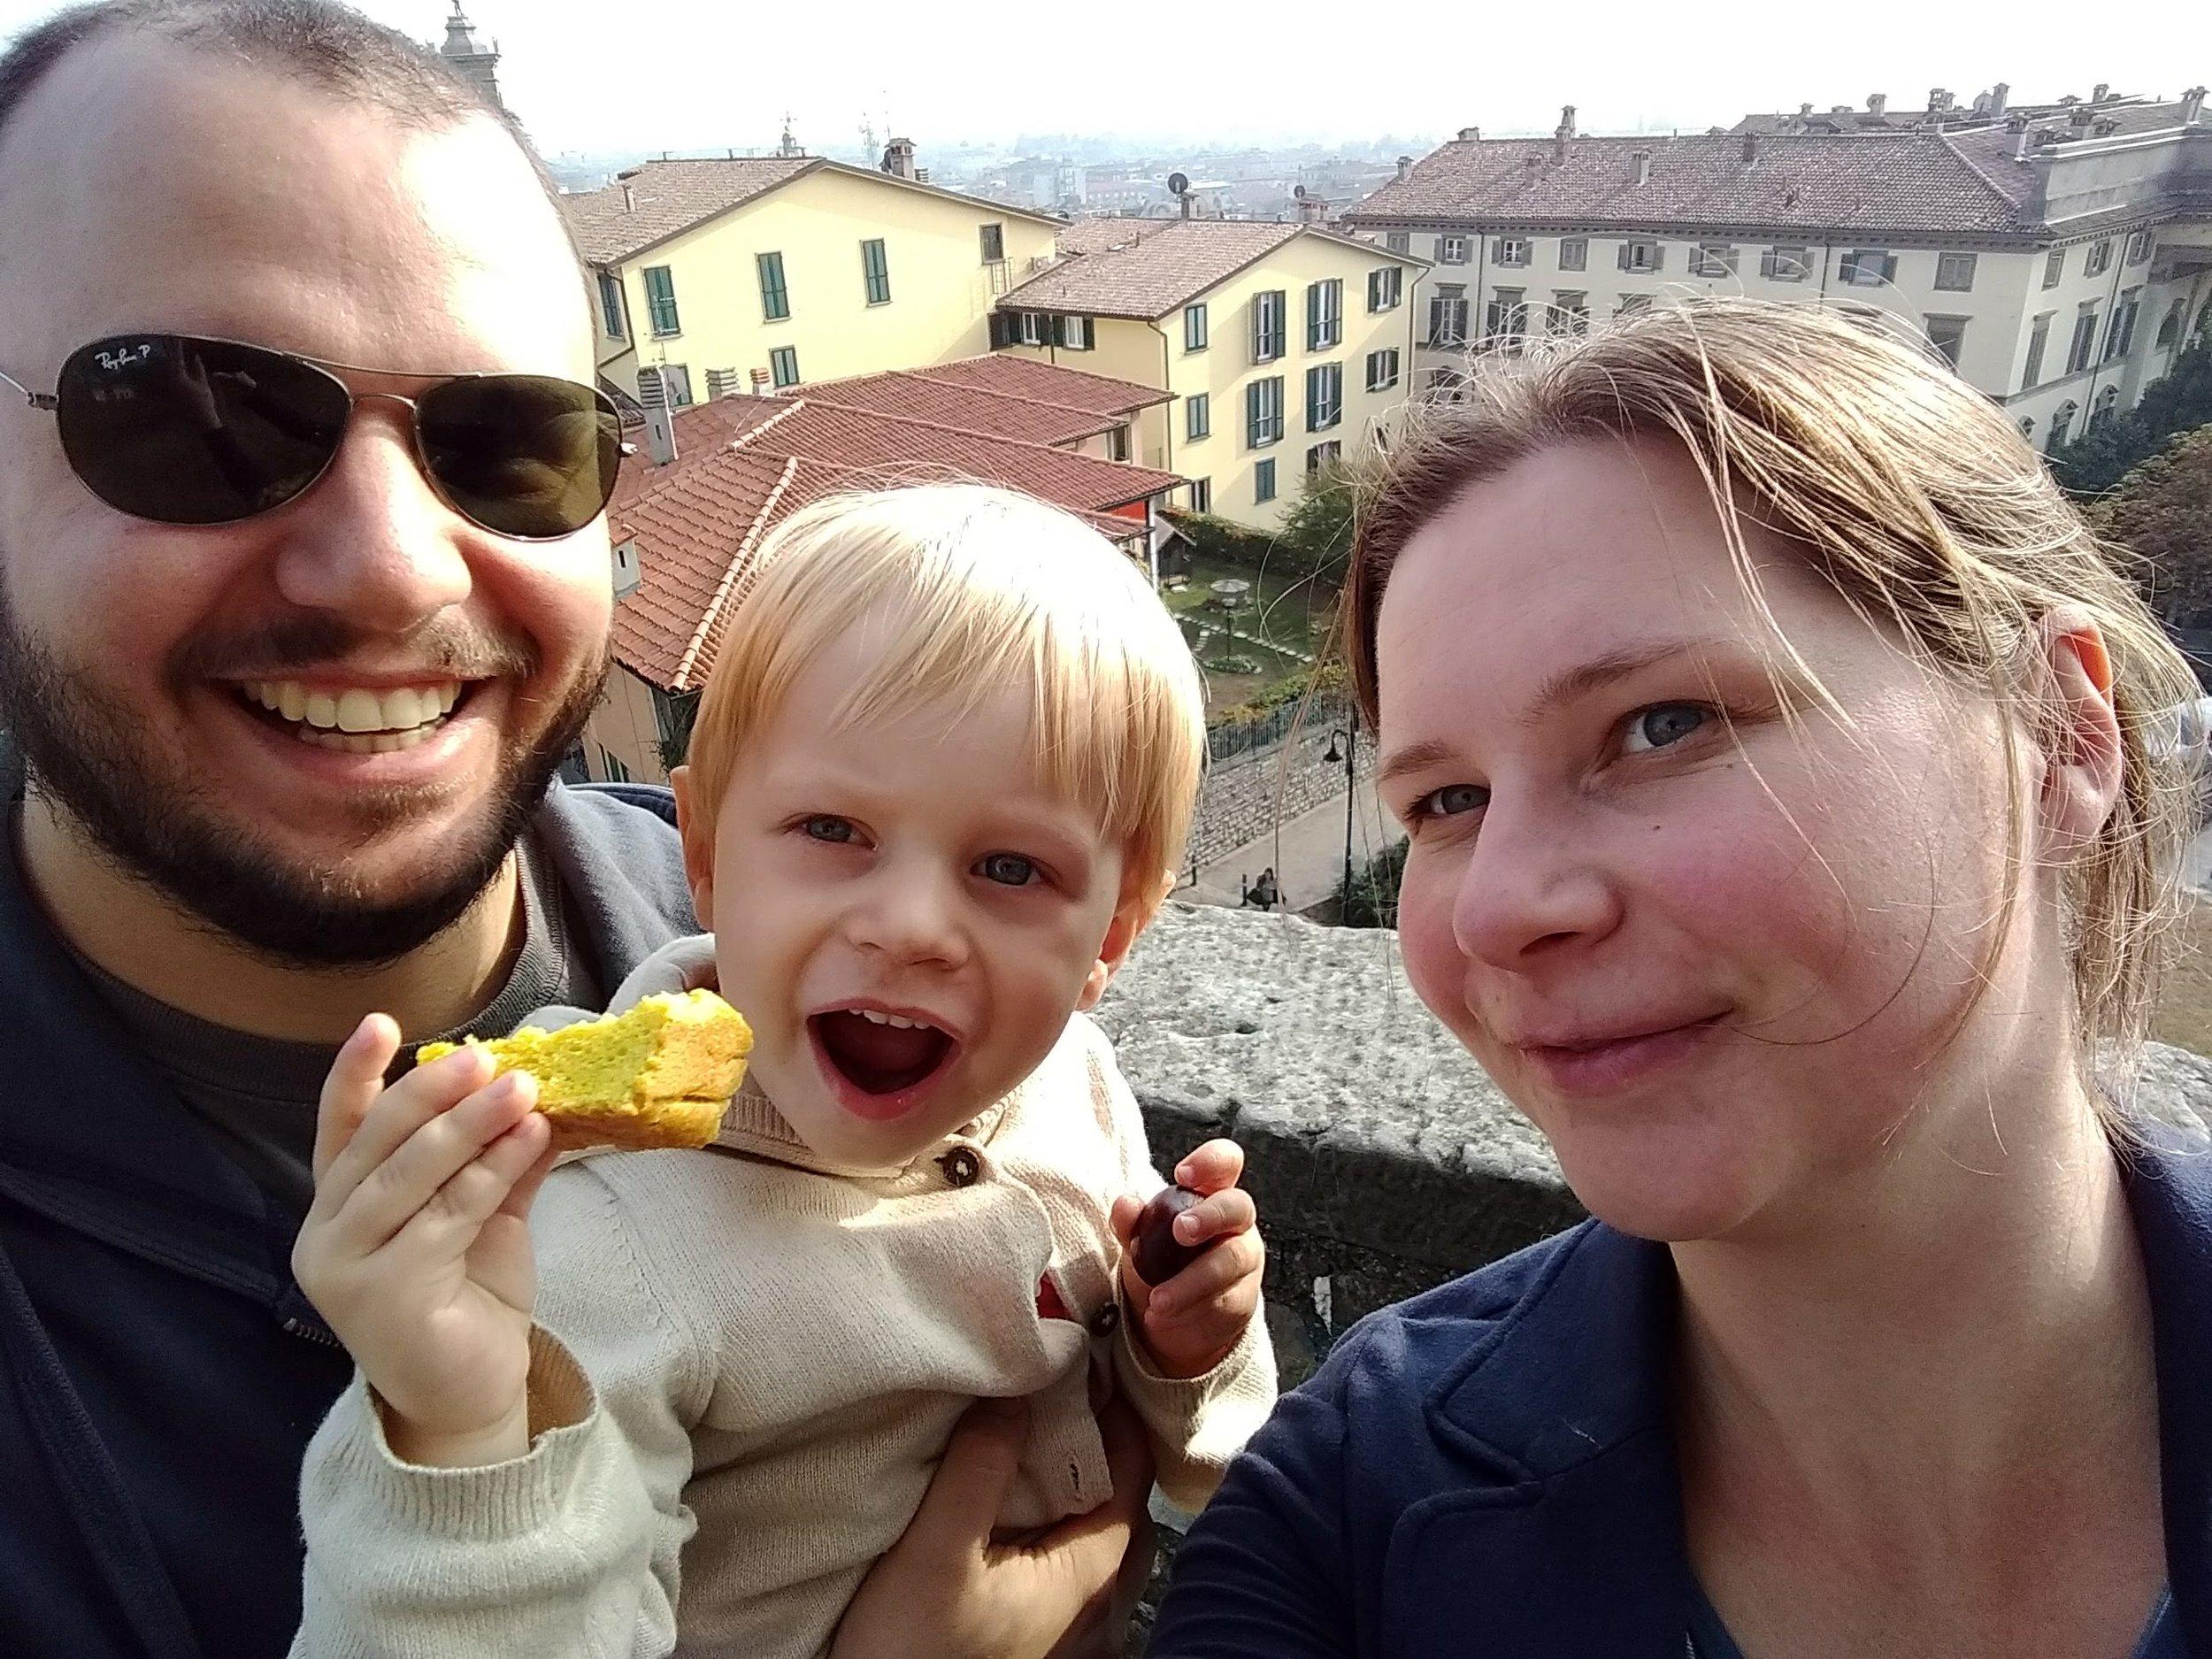 Our foodie family exploring Bergamo